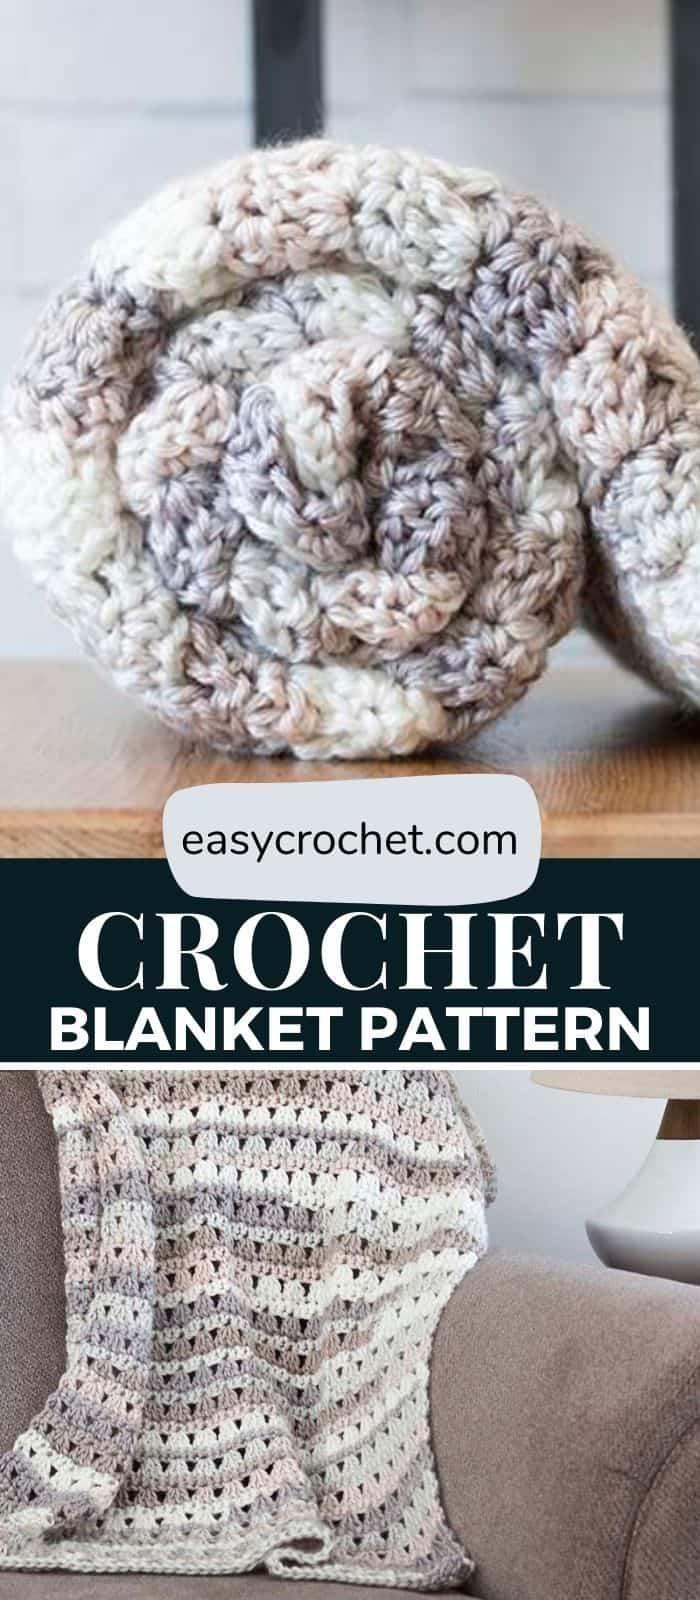 Free Crochet Blanket Pattern - Easy to make crochet blanket pattern using simple stitches. via @easycrochetcom